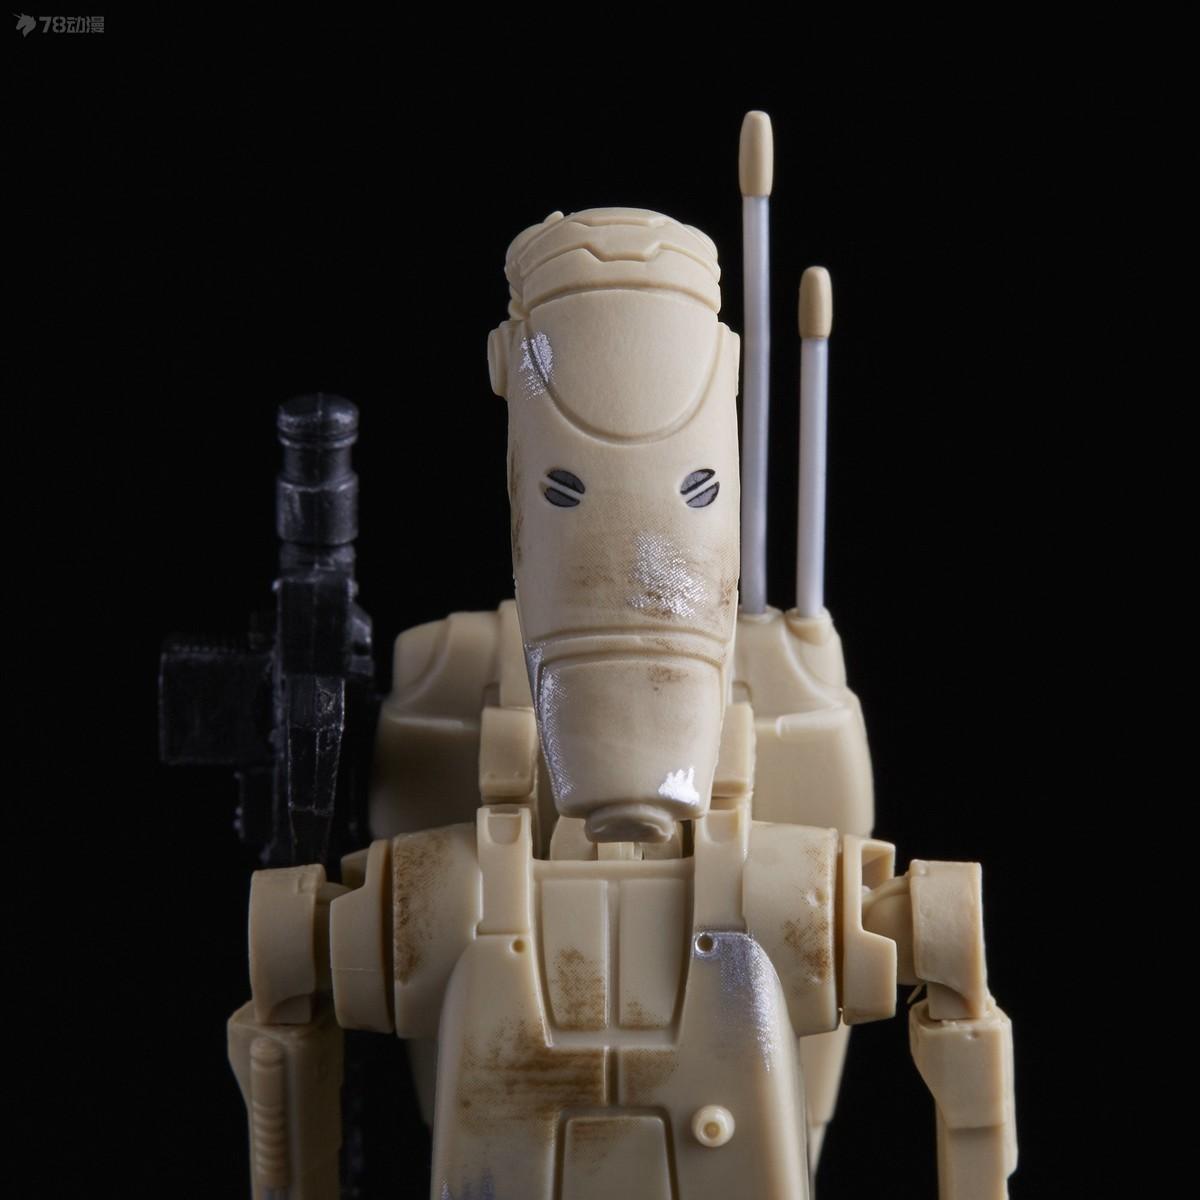 E4085_Star_Wars_The_Black_Series_Battle_Droid_Figure_4_2000x.jpg